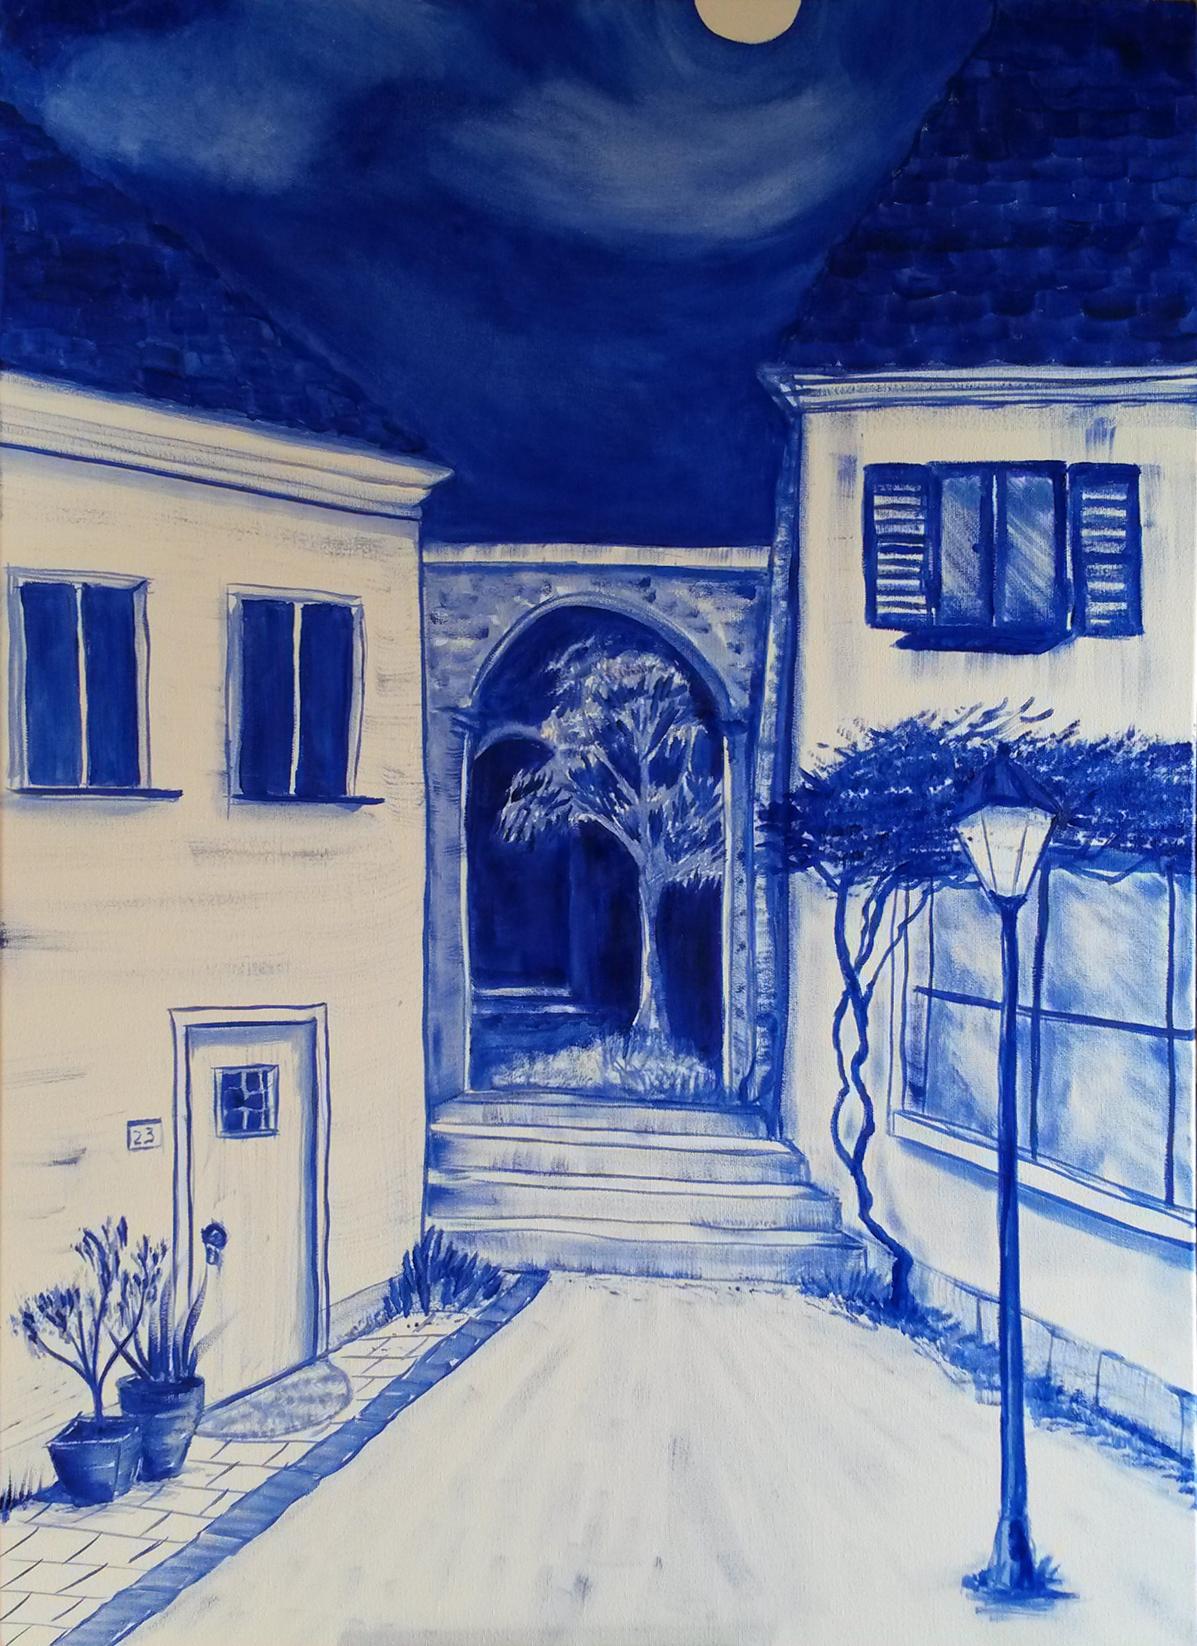 Blue moon, olieverf, 50 x 70, 2017